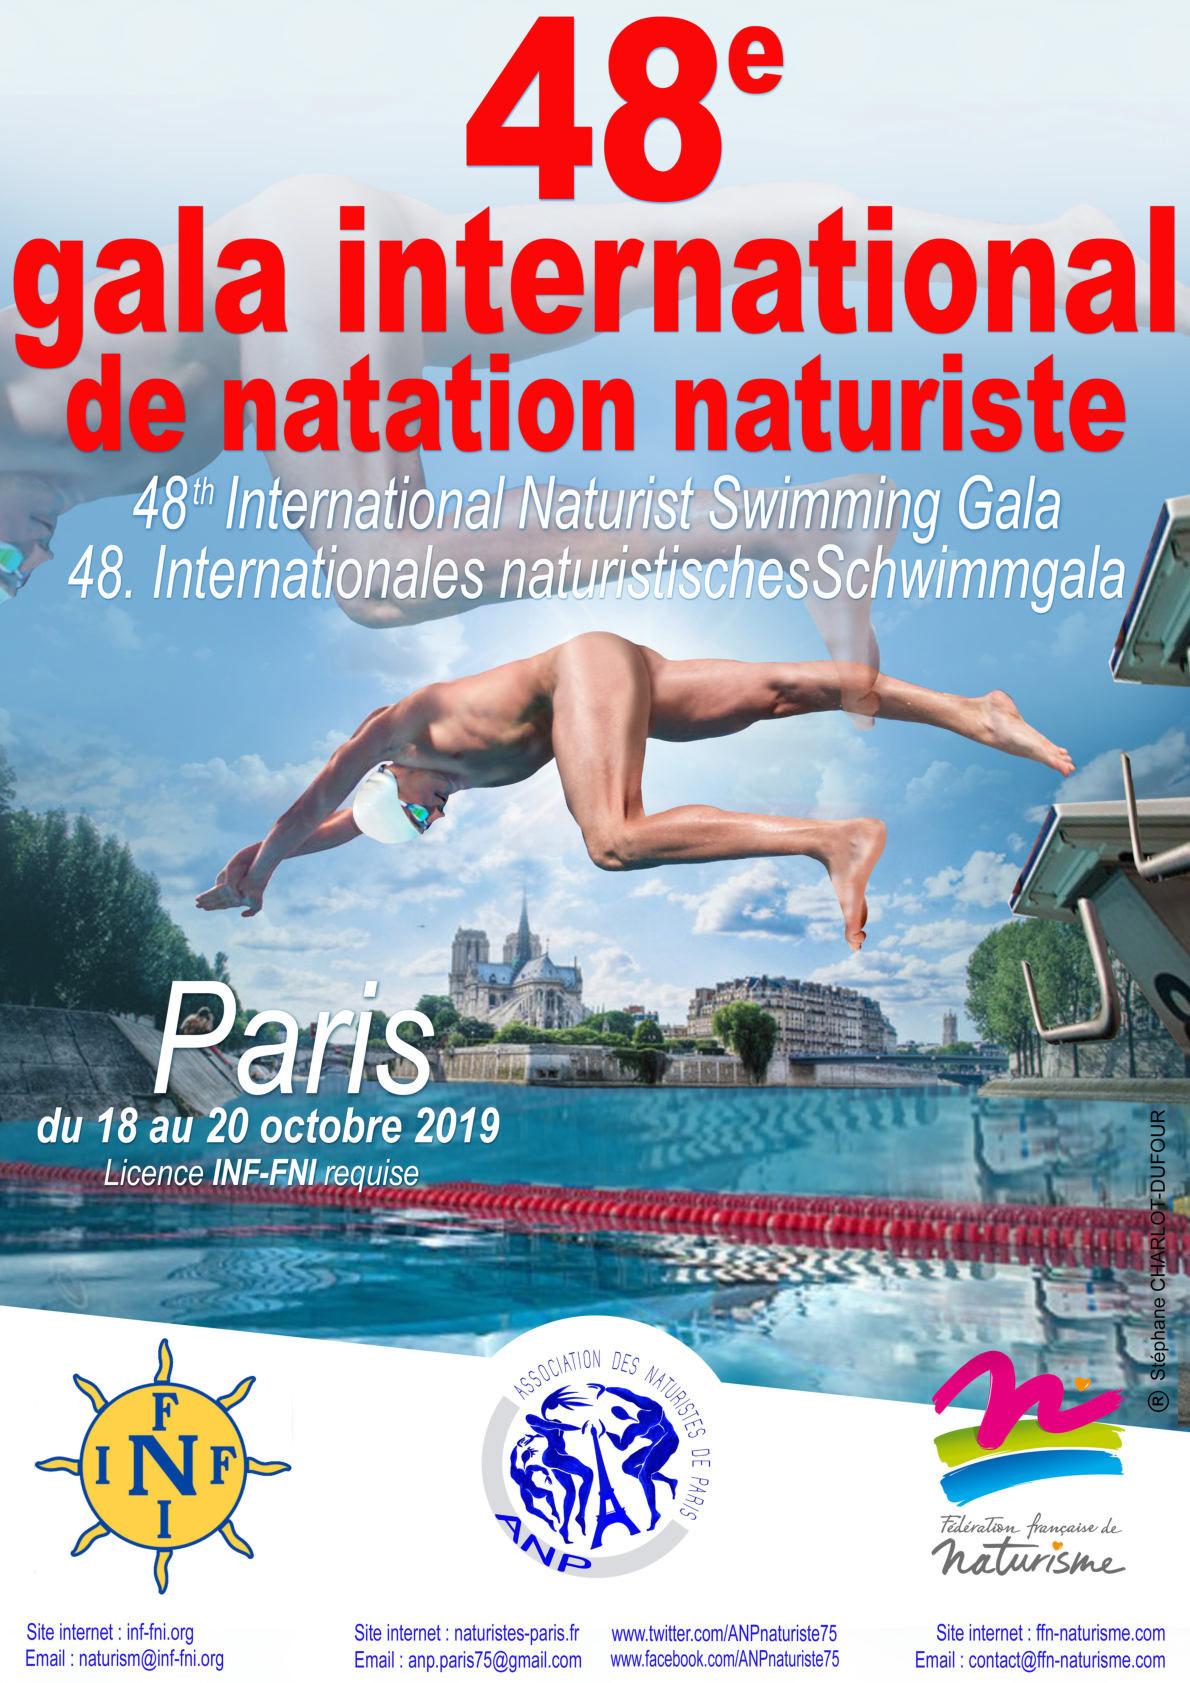 Gala Mundial de Natación nudista 2019 en París. FNI-FFN-ANP